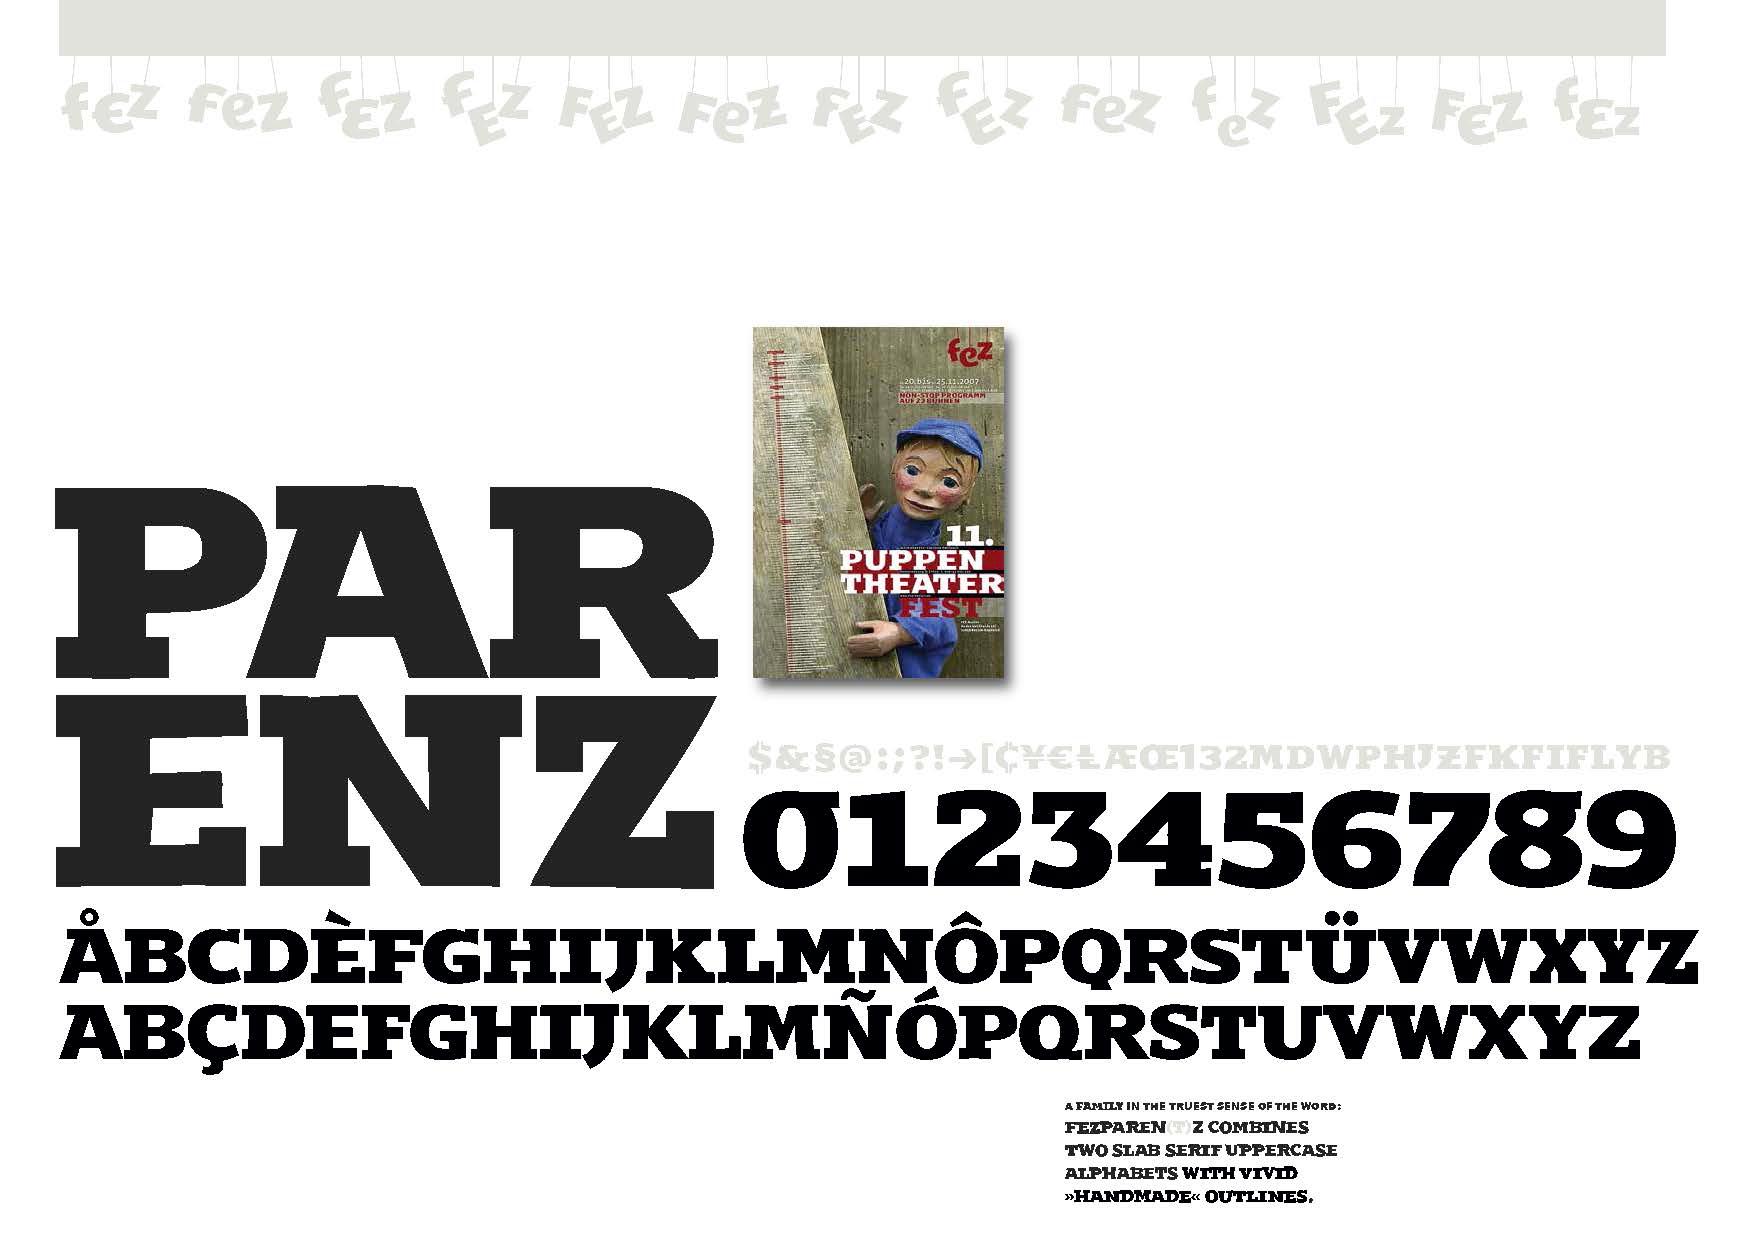 FEZ_FontRGB_kl_Seite_5